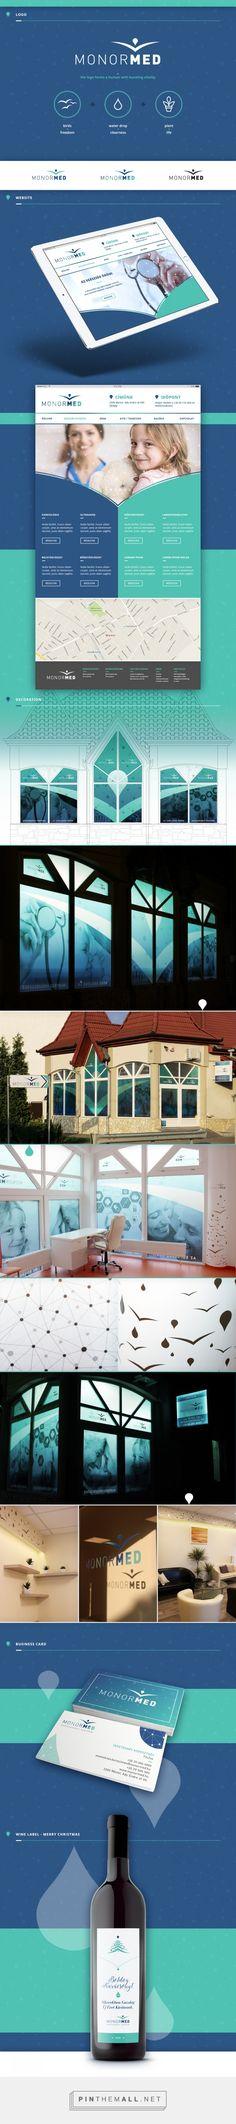 MonorMED medical clinic - identity & decoration on Behance by Virag Veszteg